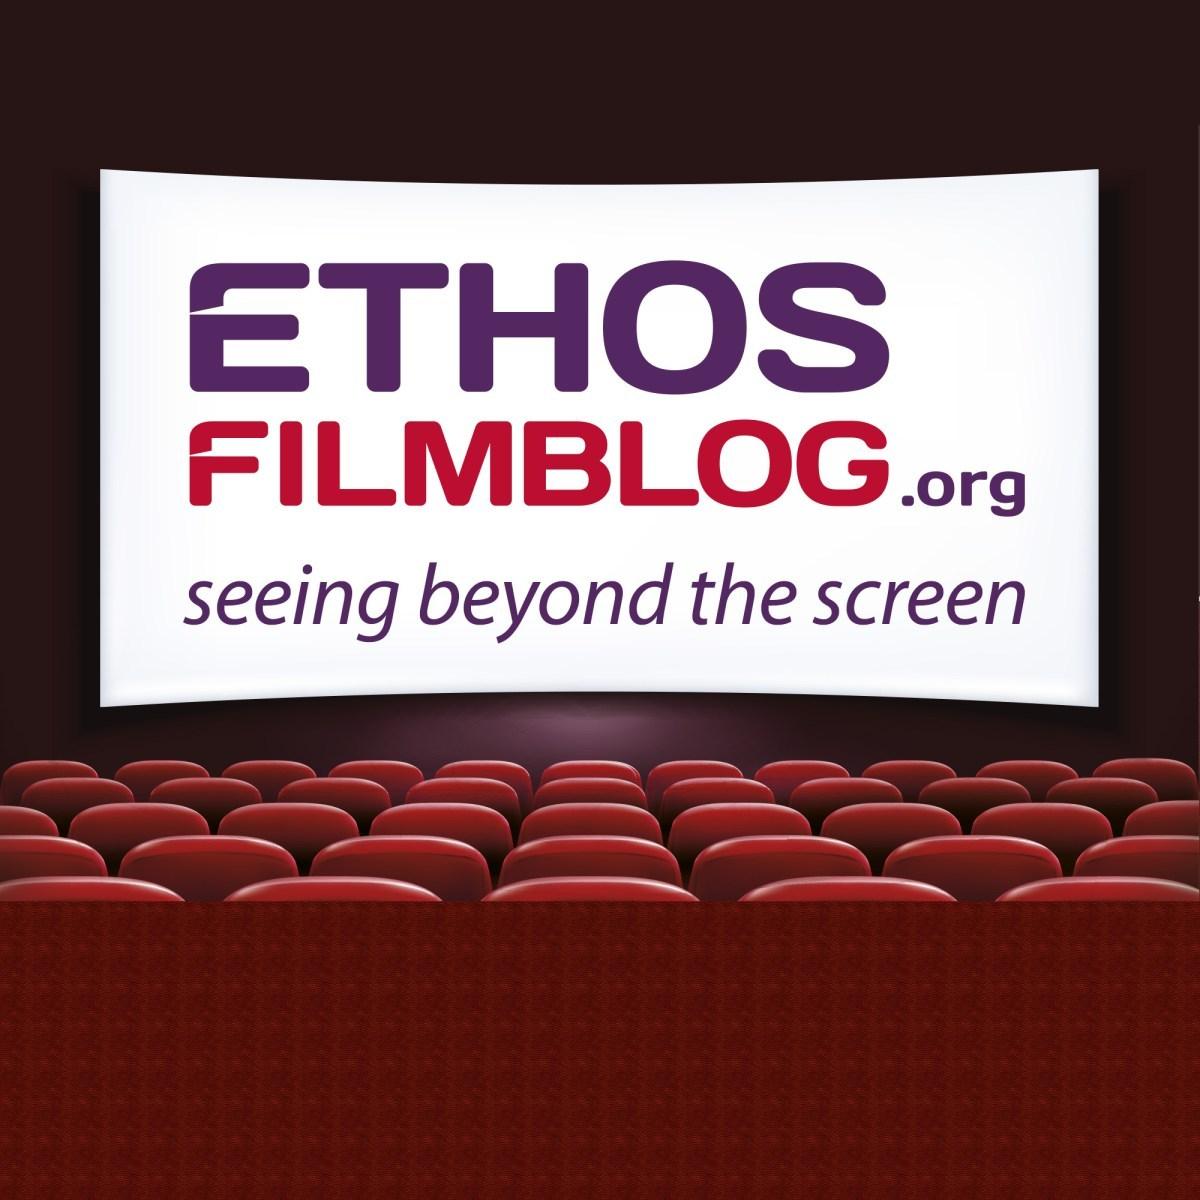 Ethos media film blog